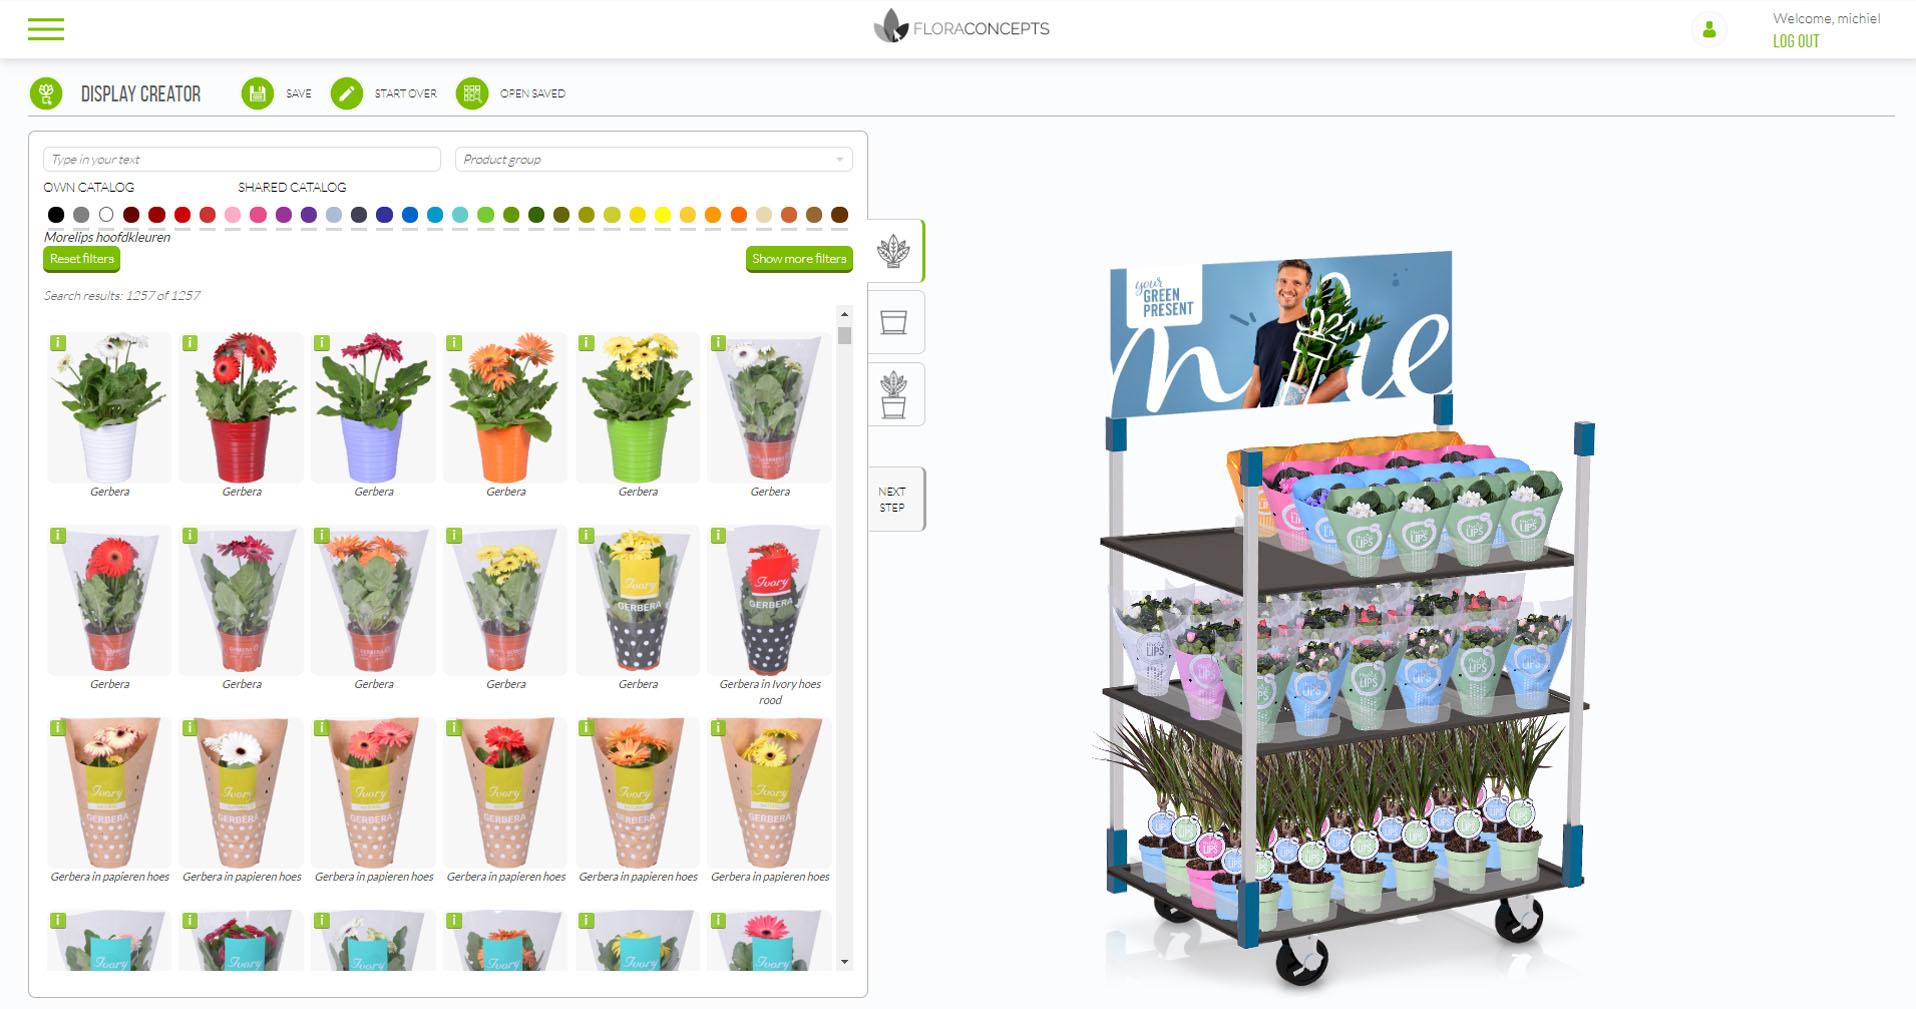 Display Creator Floraconcepts